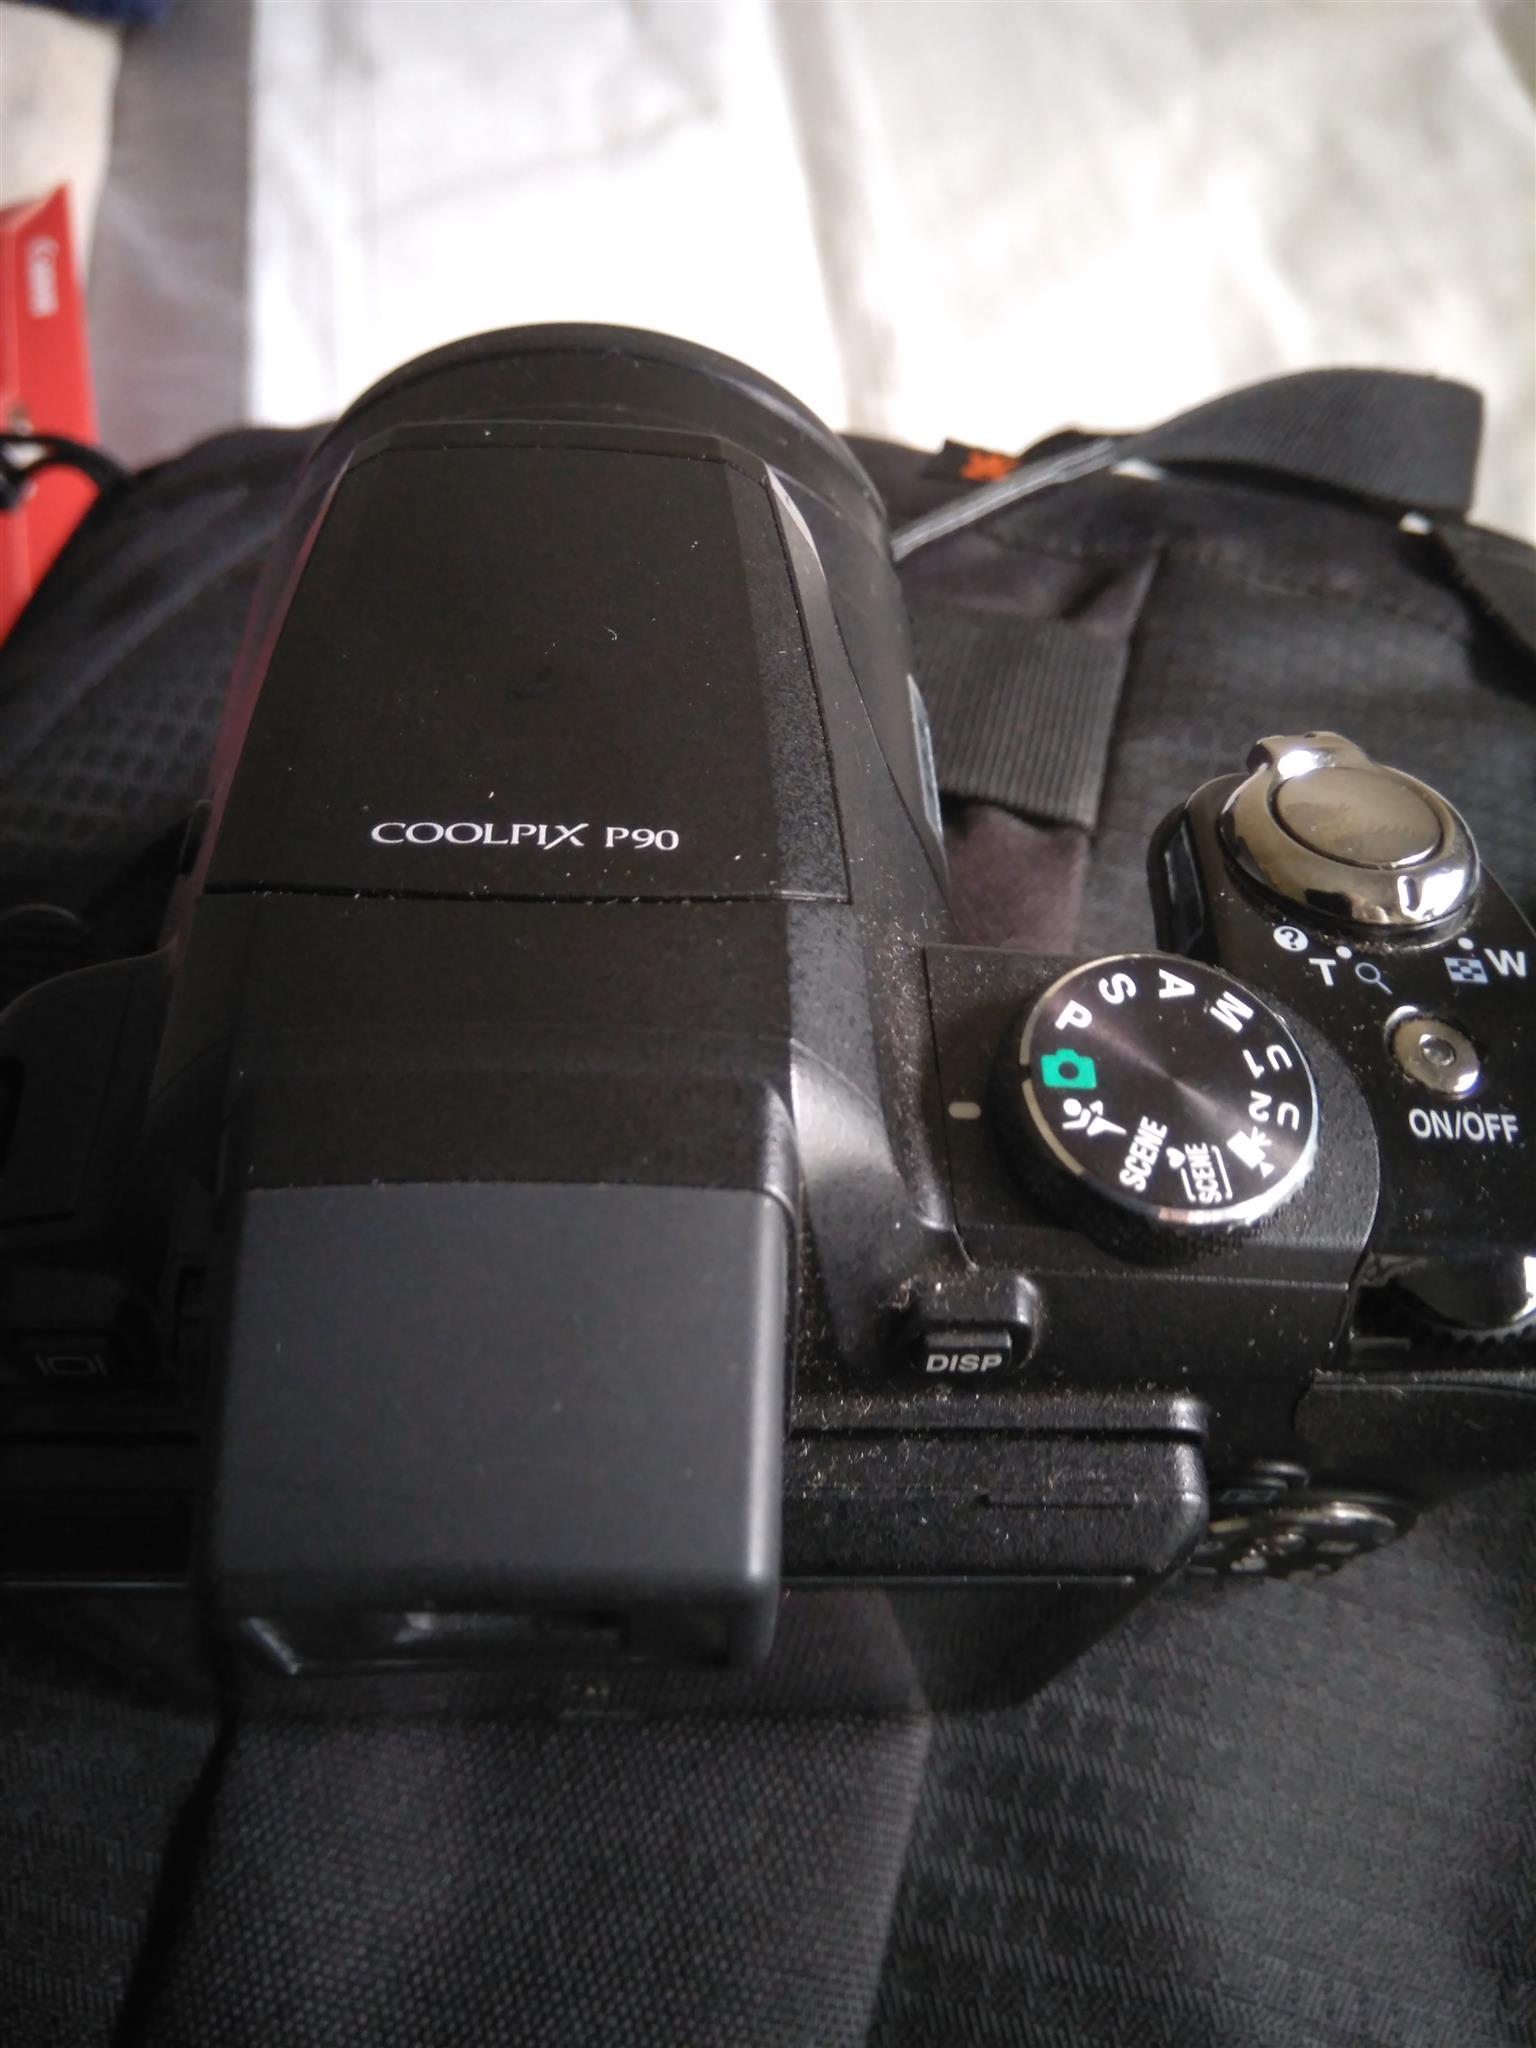 Nikon CoolpixP90 Camera